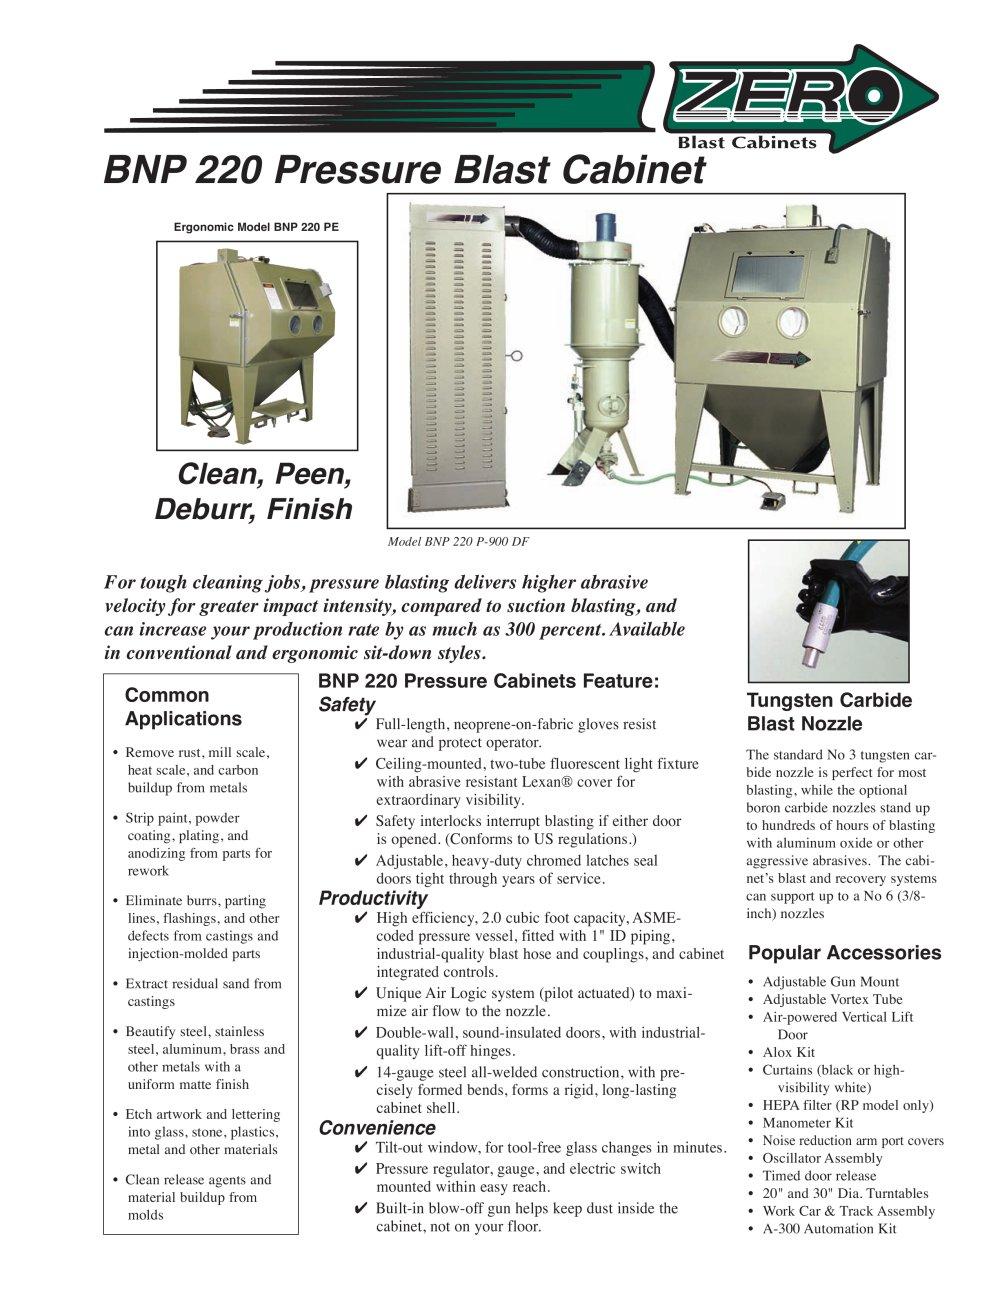 Clemco Industries Blast Cabinets Bnp 220 Pressure Blast Cabinet Rev E Clemco Industries Pdf